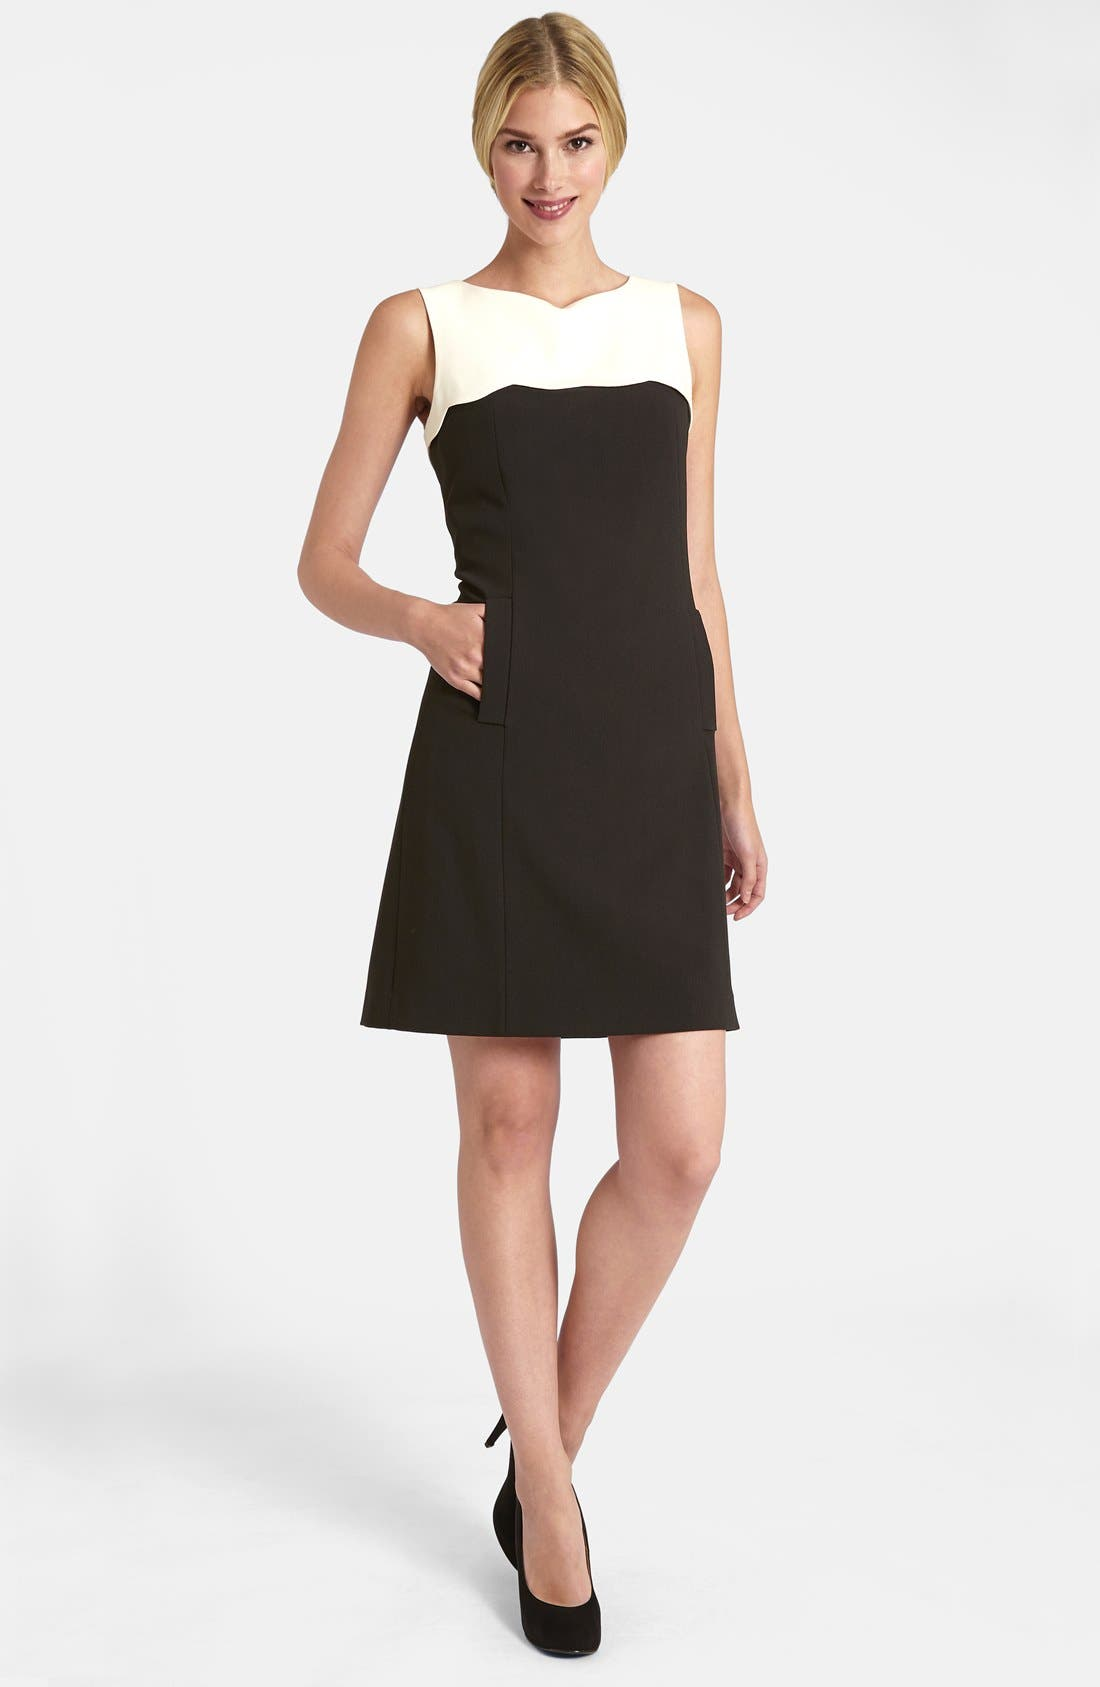 Alternate Image 1 Selected - Tahari Scalloped Yoke Stretch Crepe Dress (Petite)